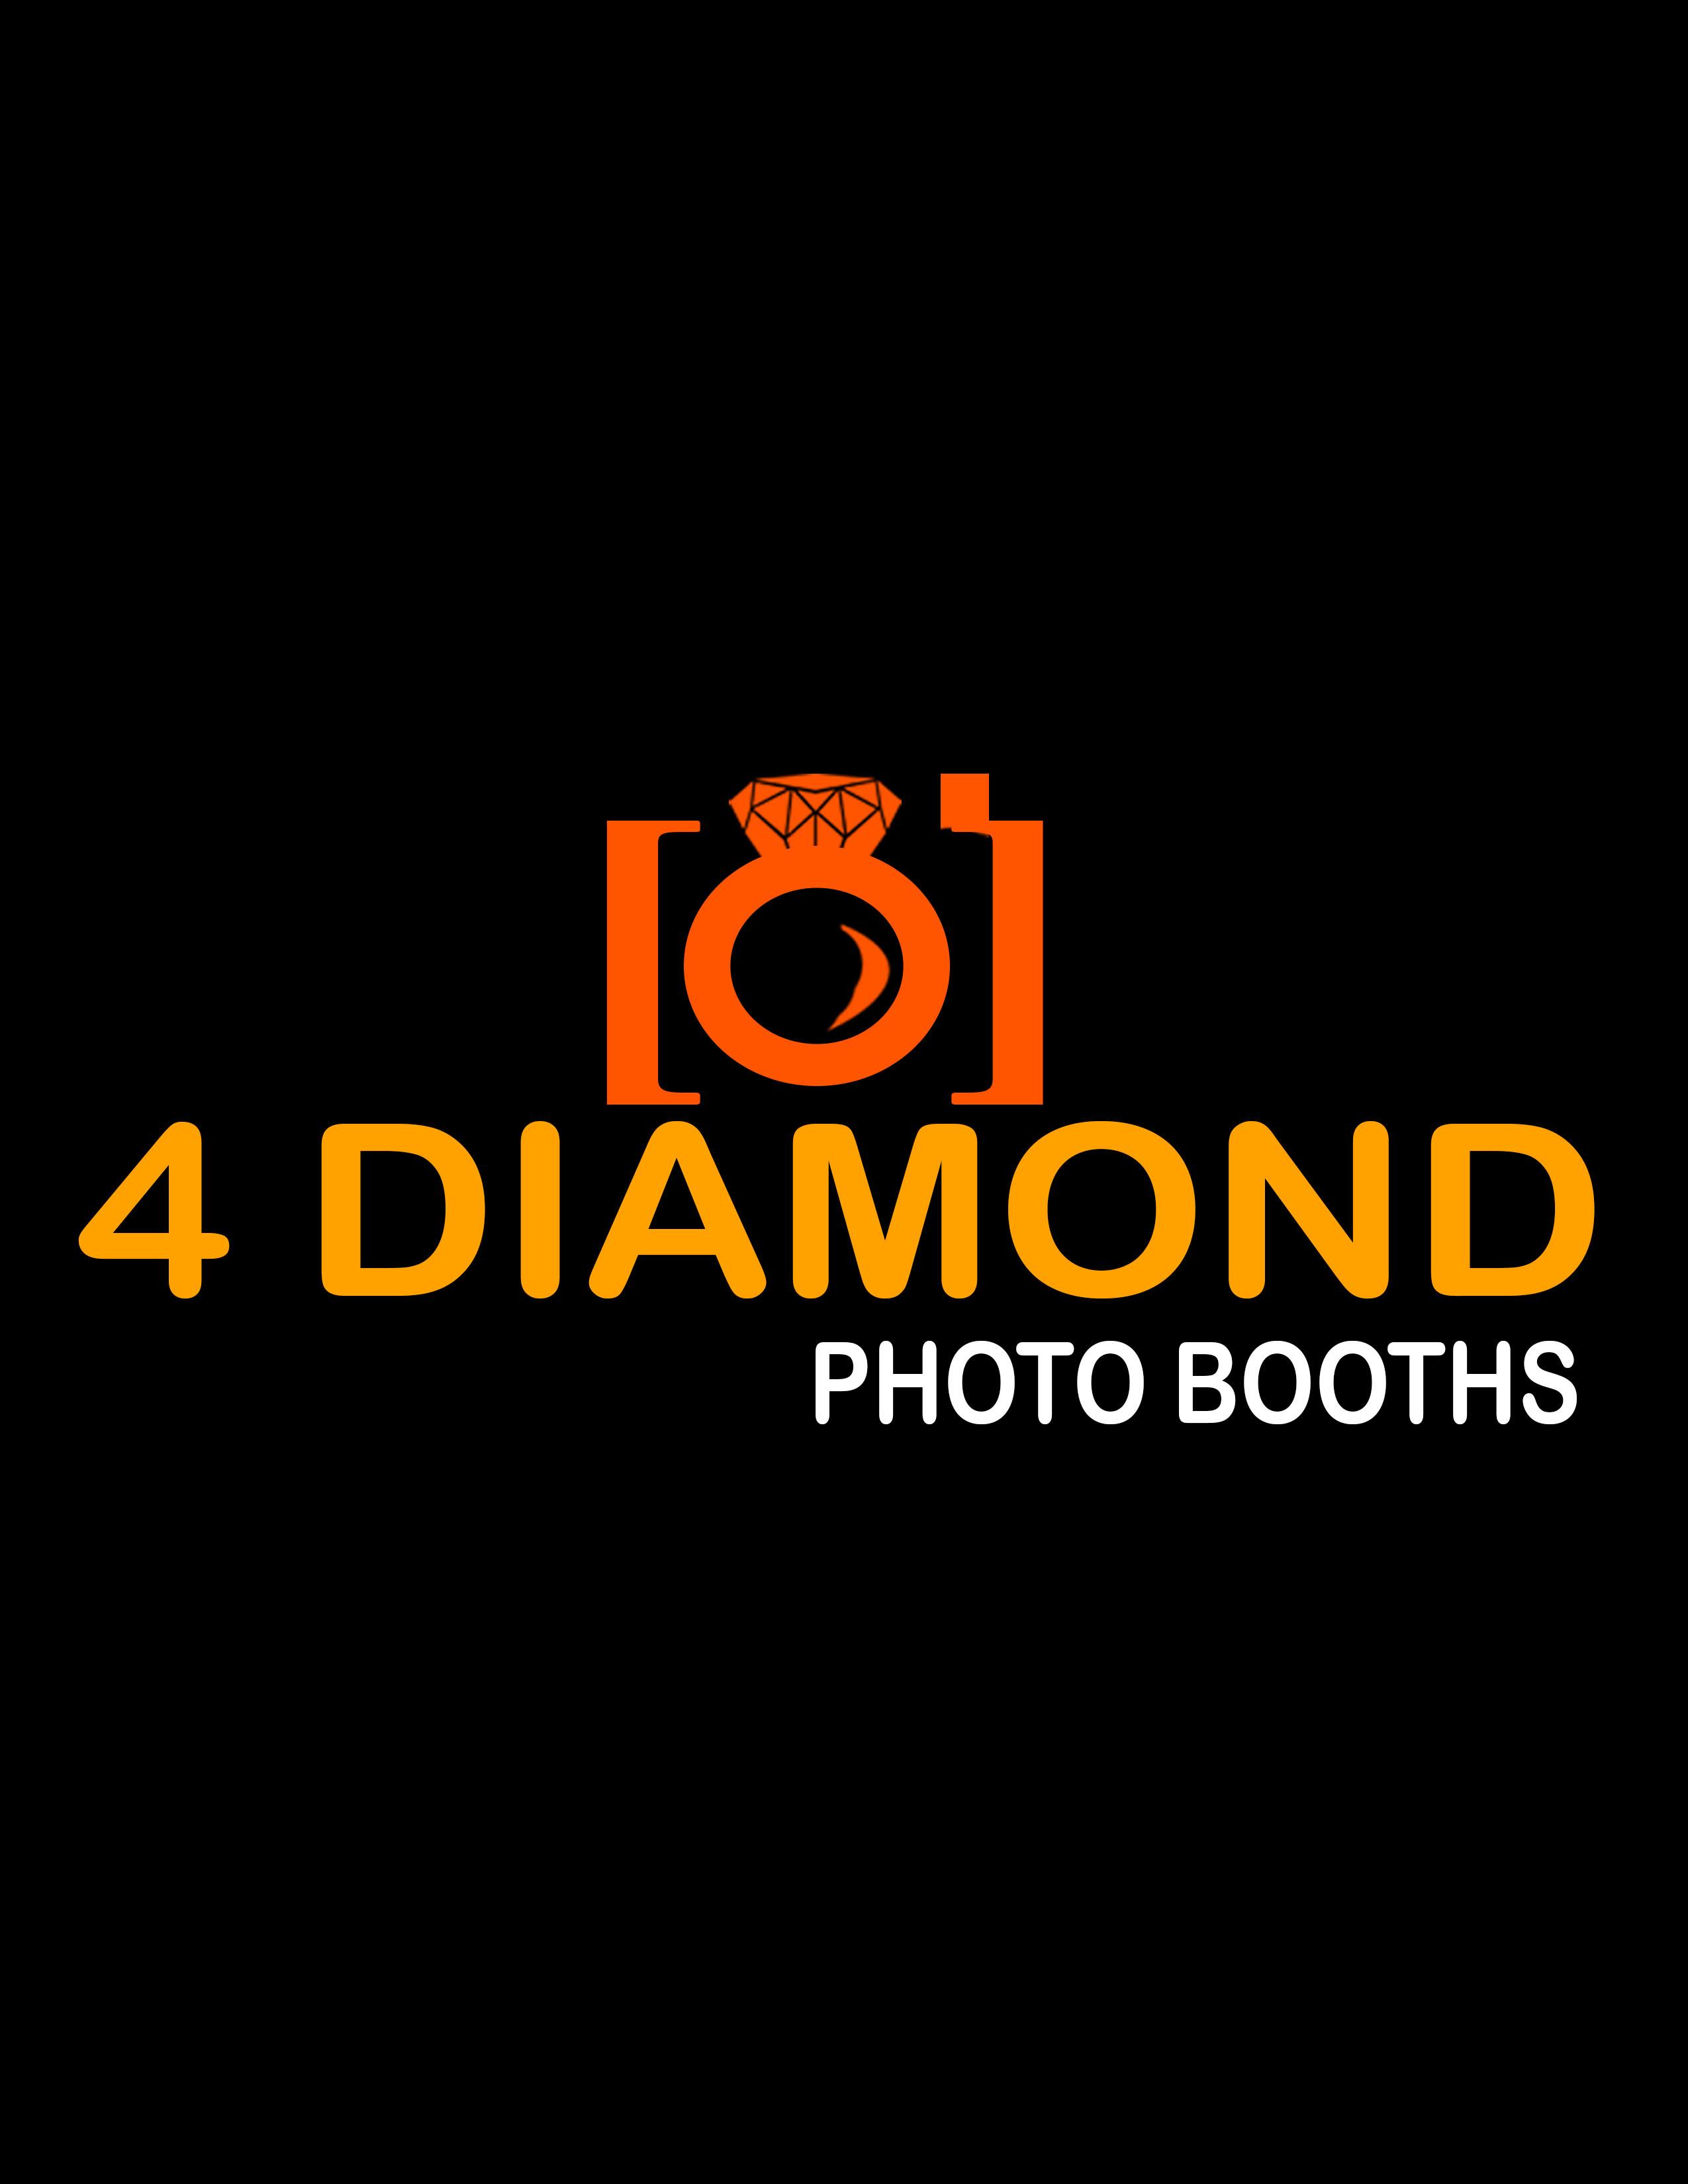 Logo Design by kjm22 - Entry No. 32 in the Logo Design Contest Creative Logo Design for 4 Diamond Photo Booths.